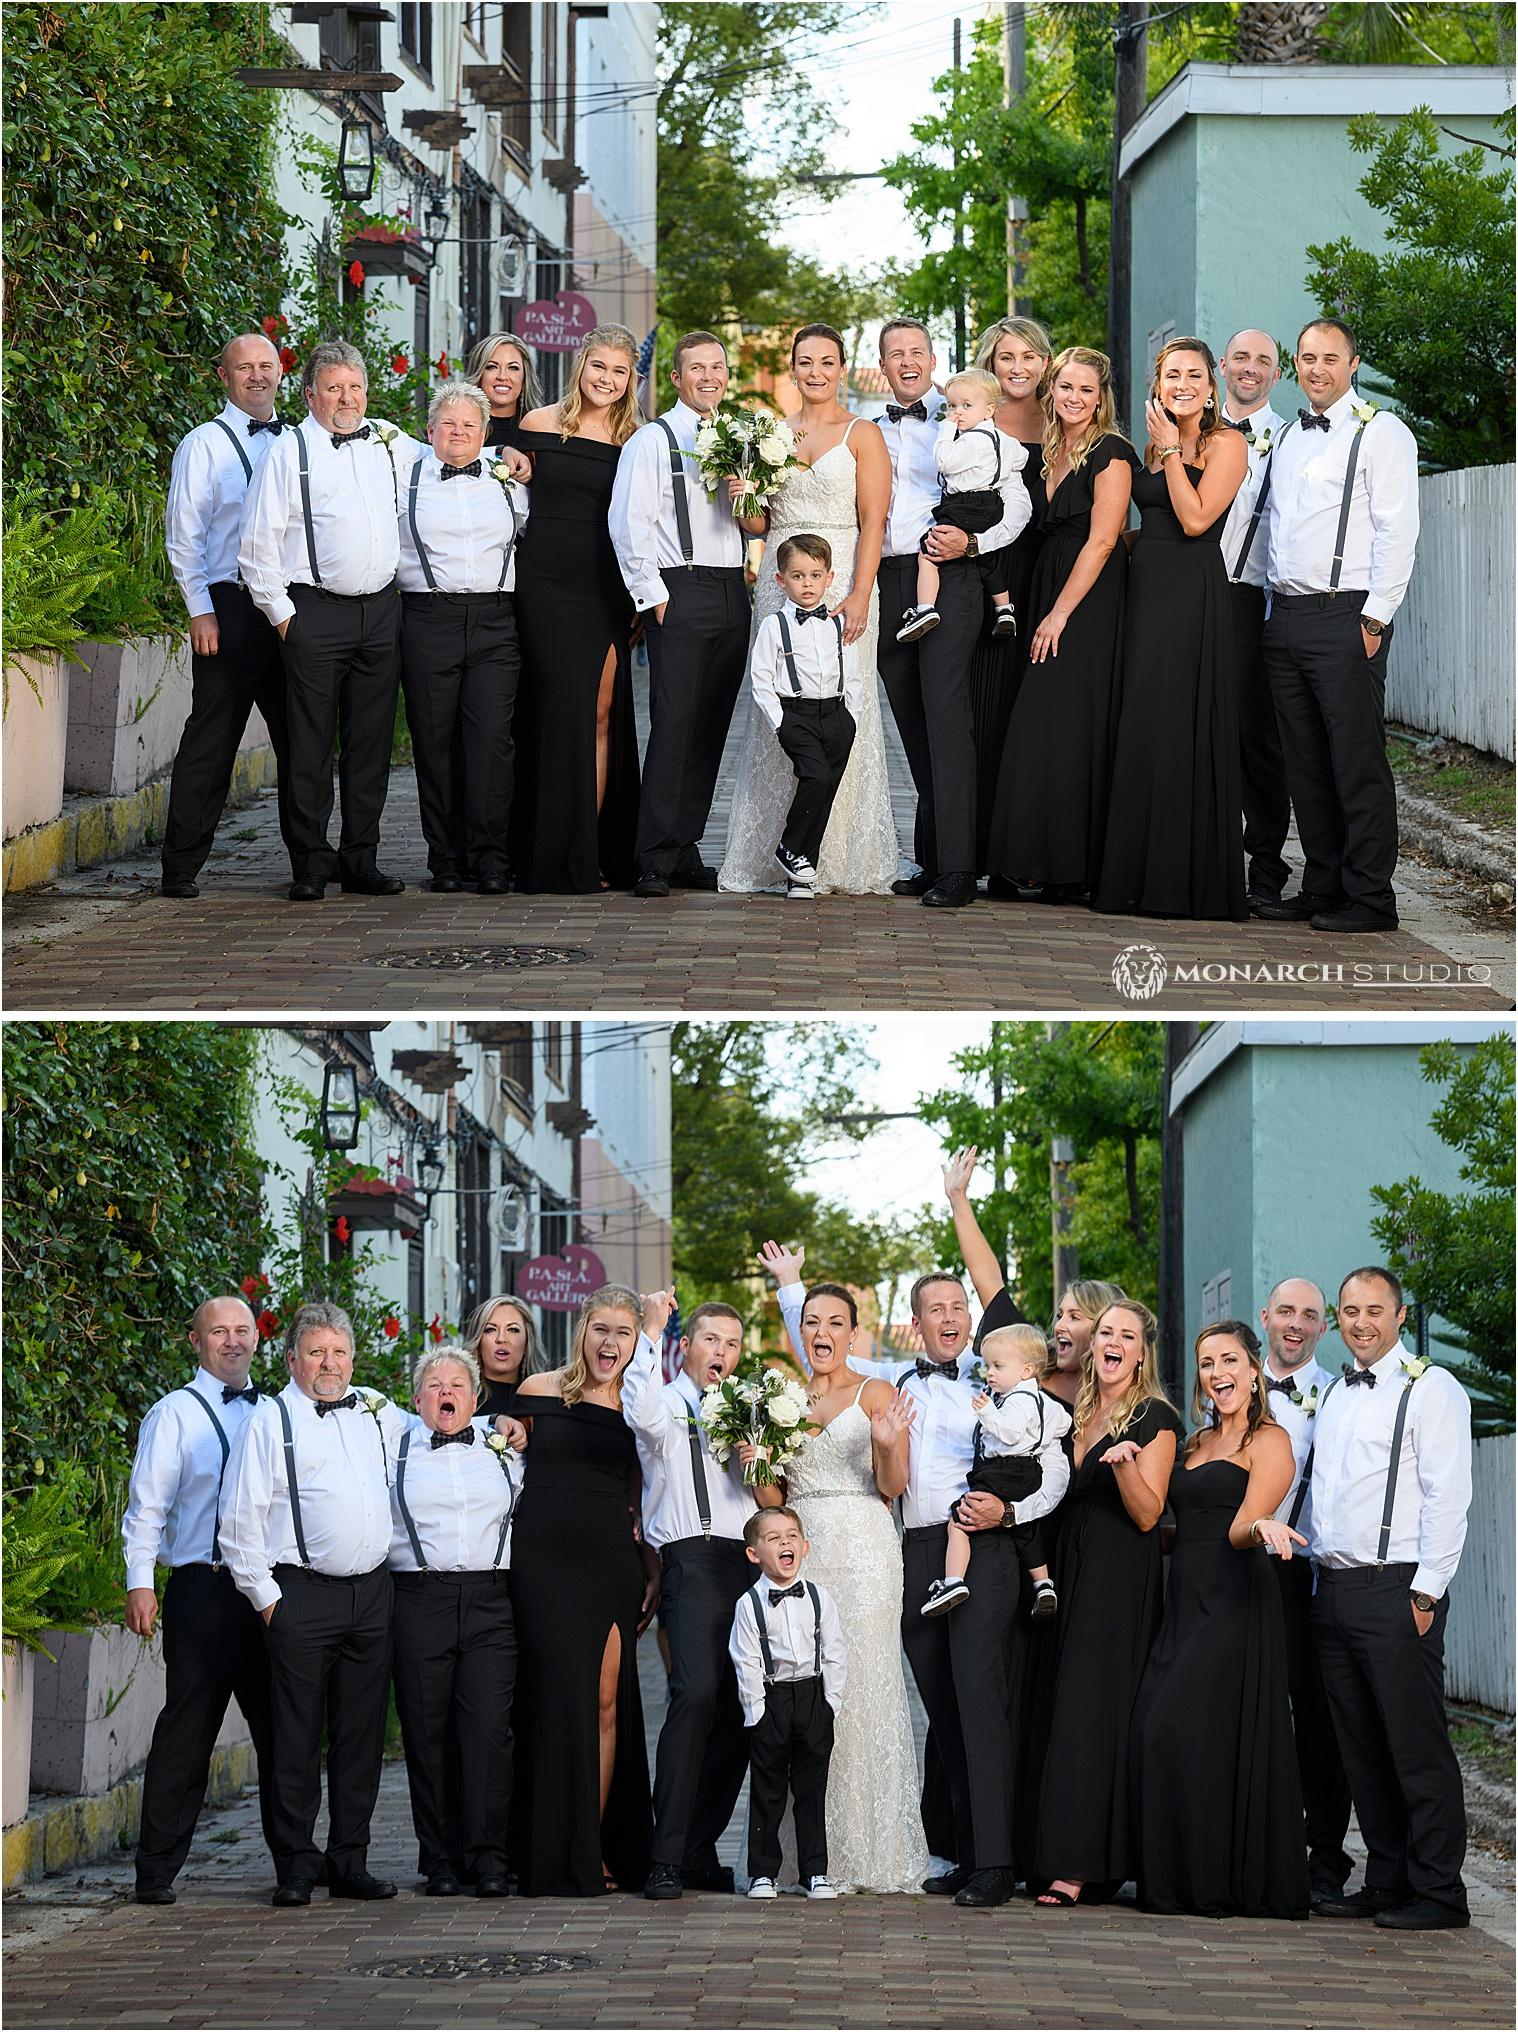 053-whiteroom-wedding-photographer-2019-05-22_0035.jpg